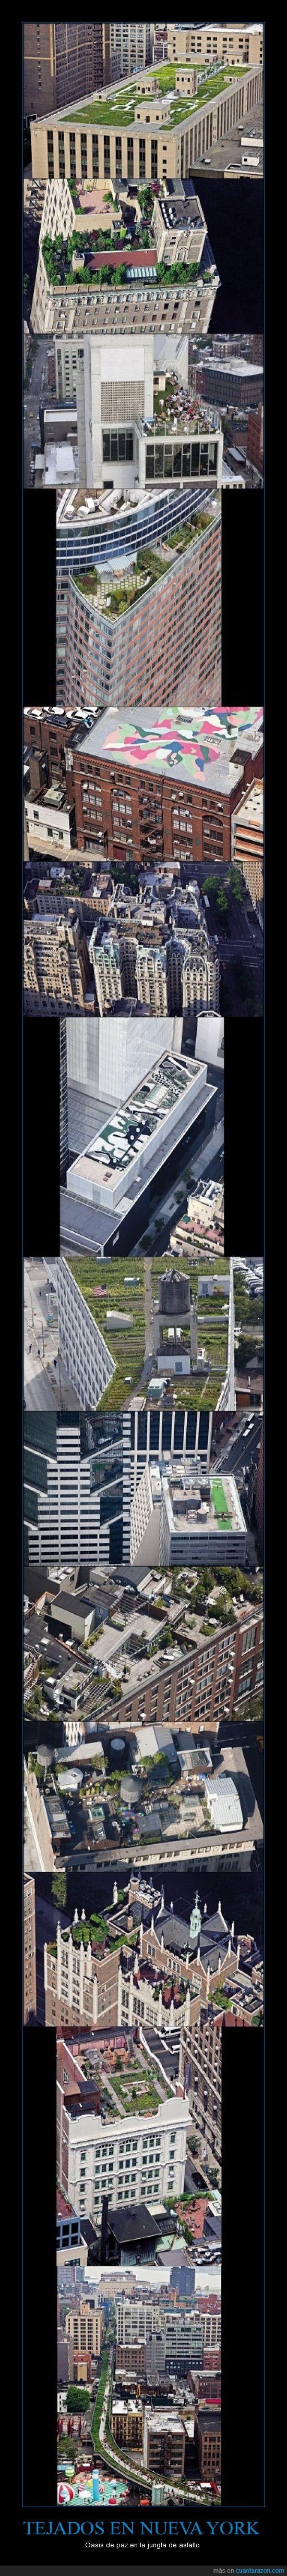 bonito,jardín,jardines,new york,nueva york,NY,oasis,paz,tejados